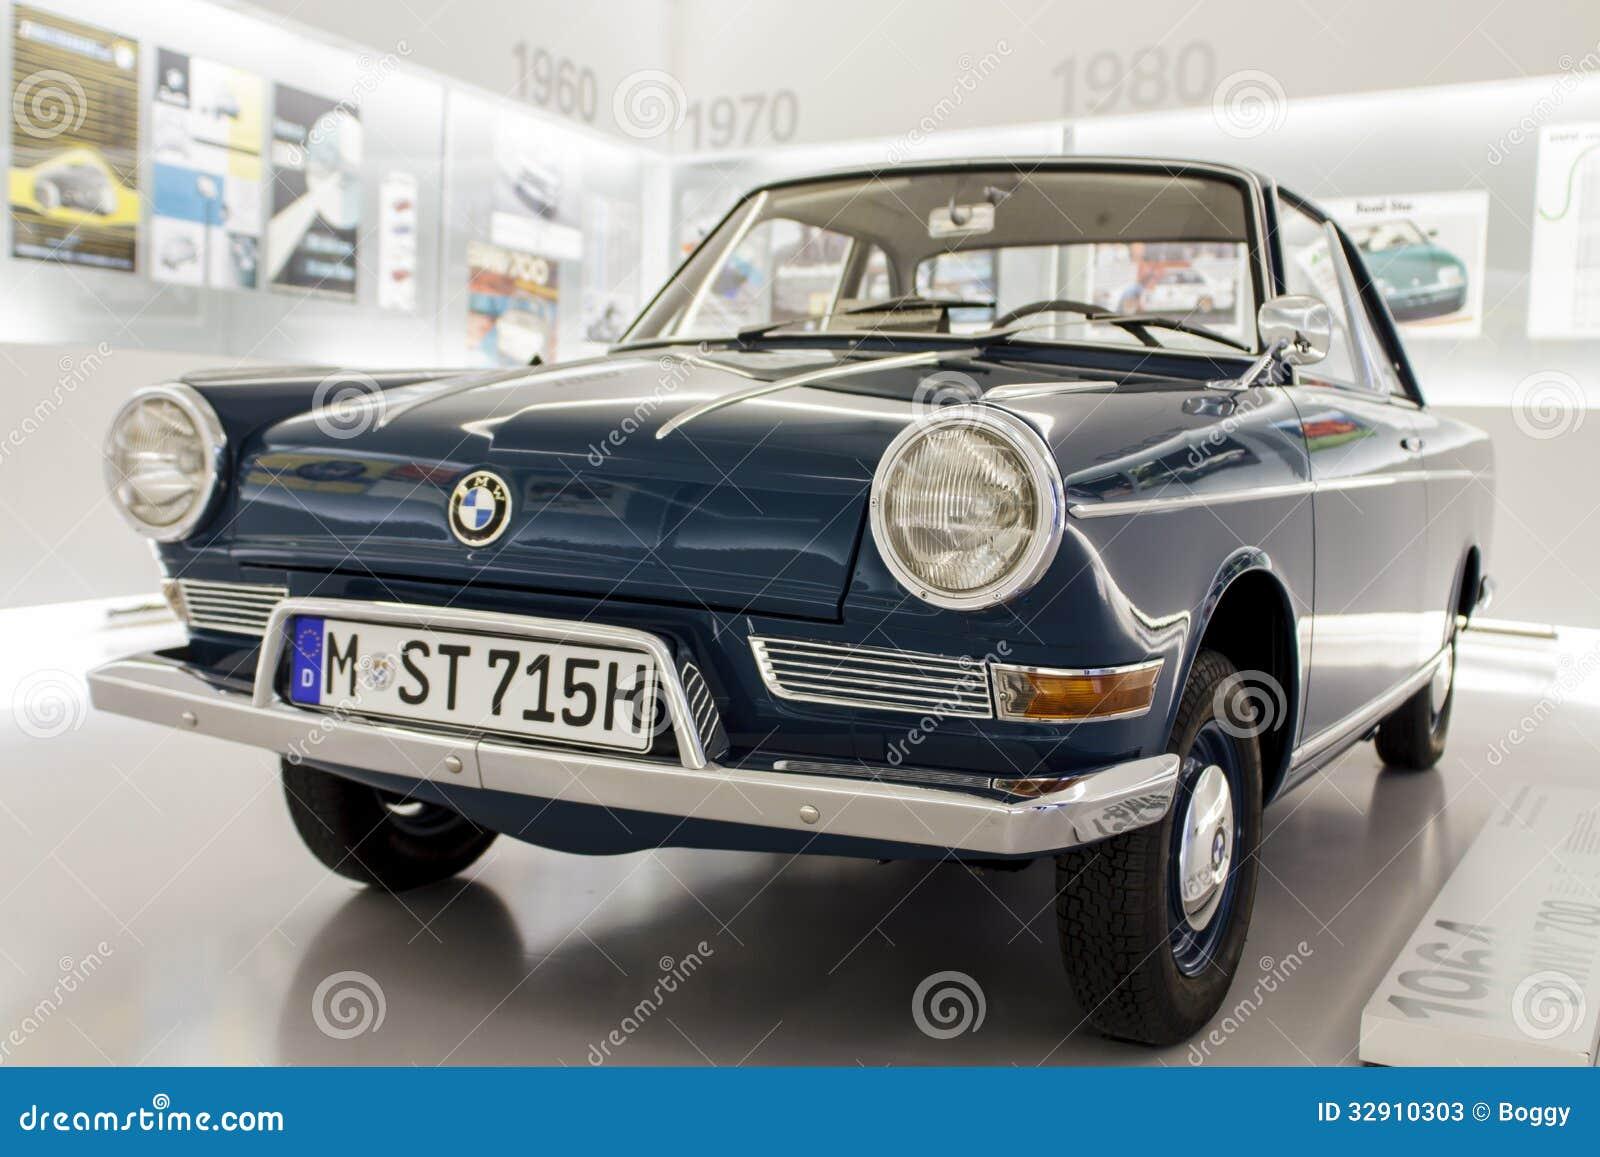 BMW 700 (1964) In BMW Museum, Munich Editorial Stock Photo ...